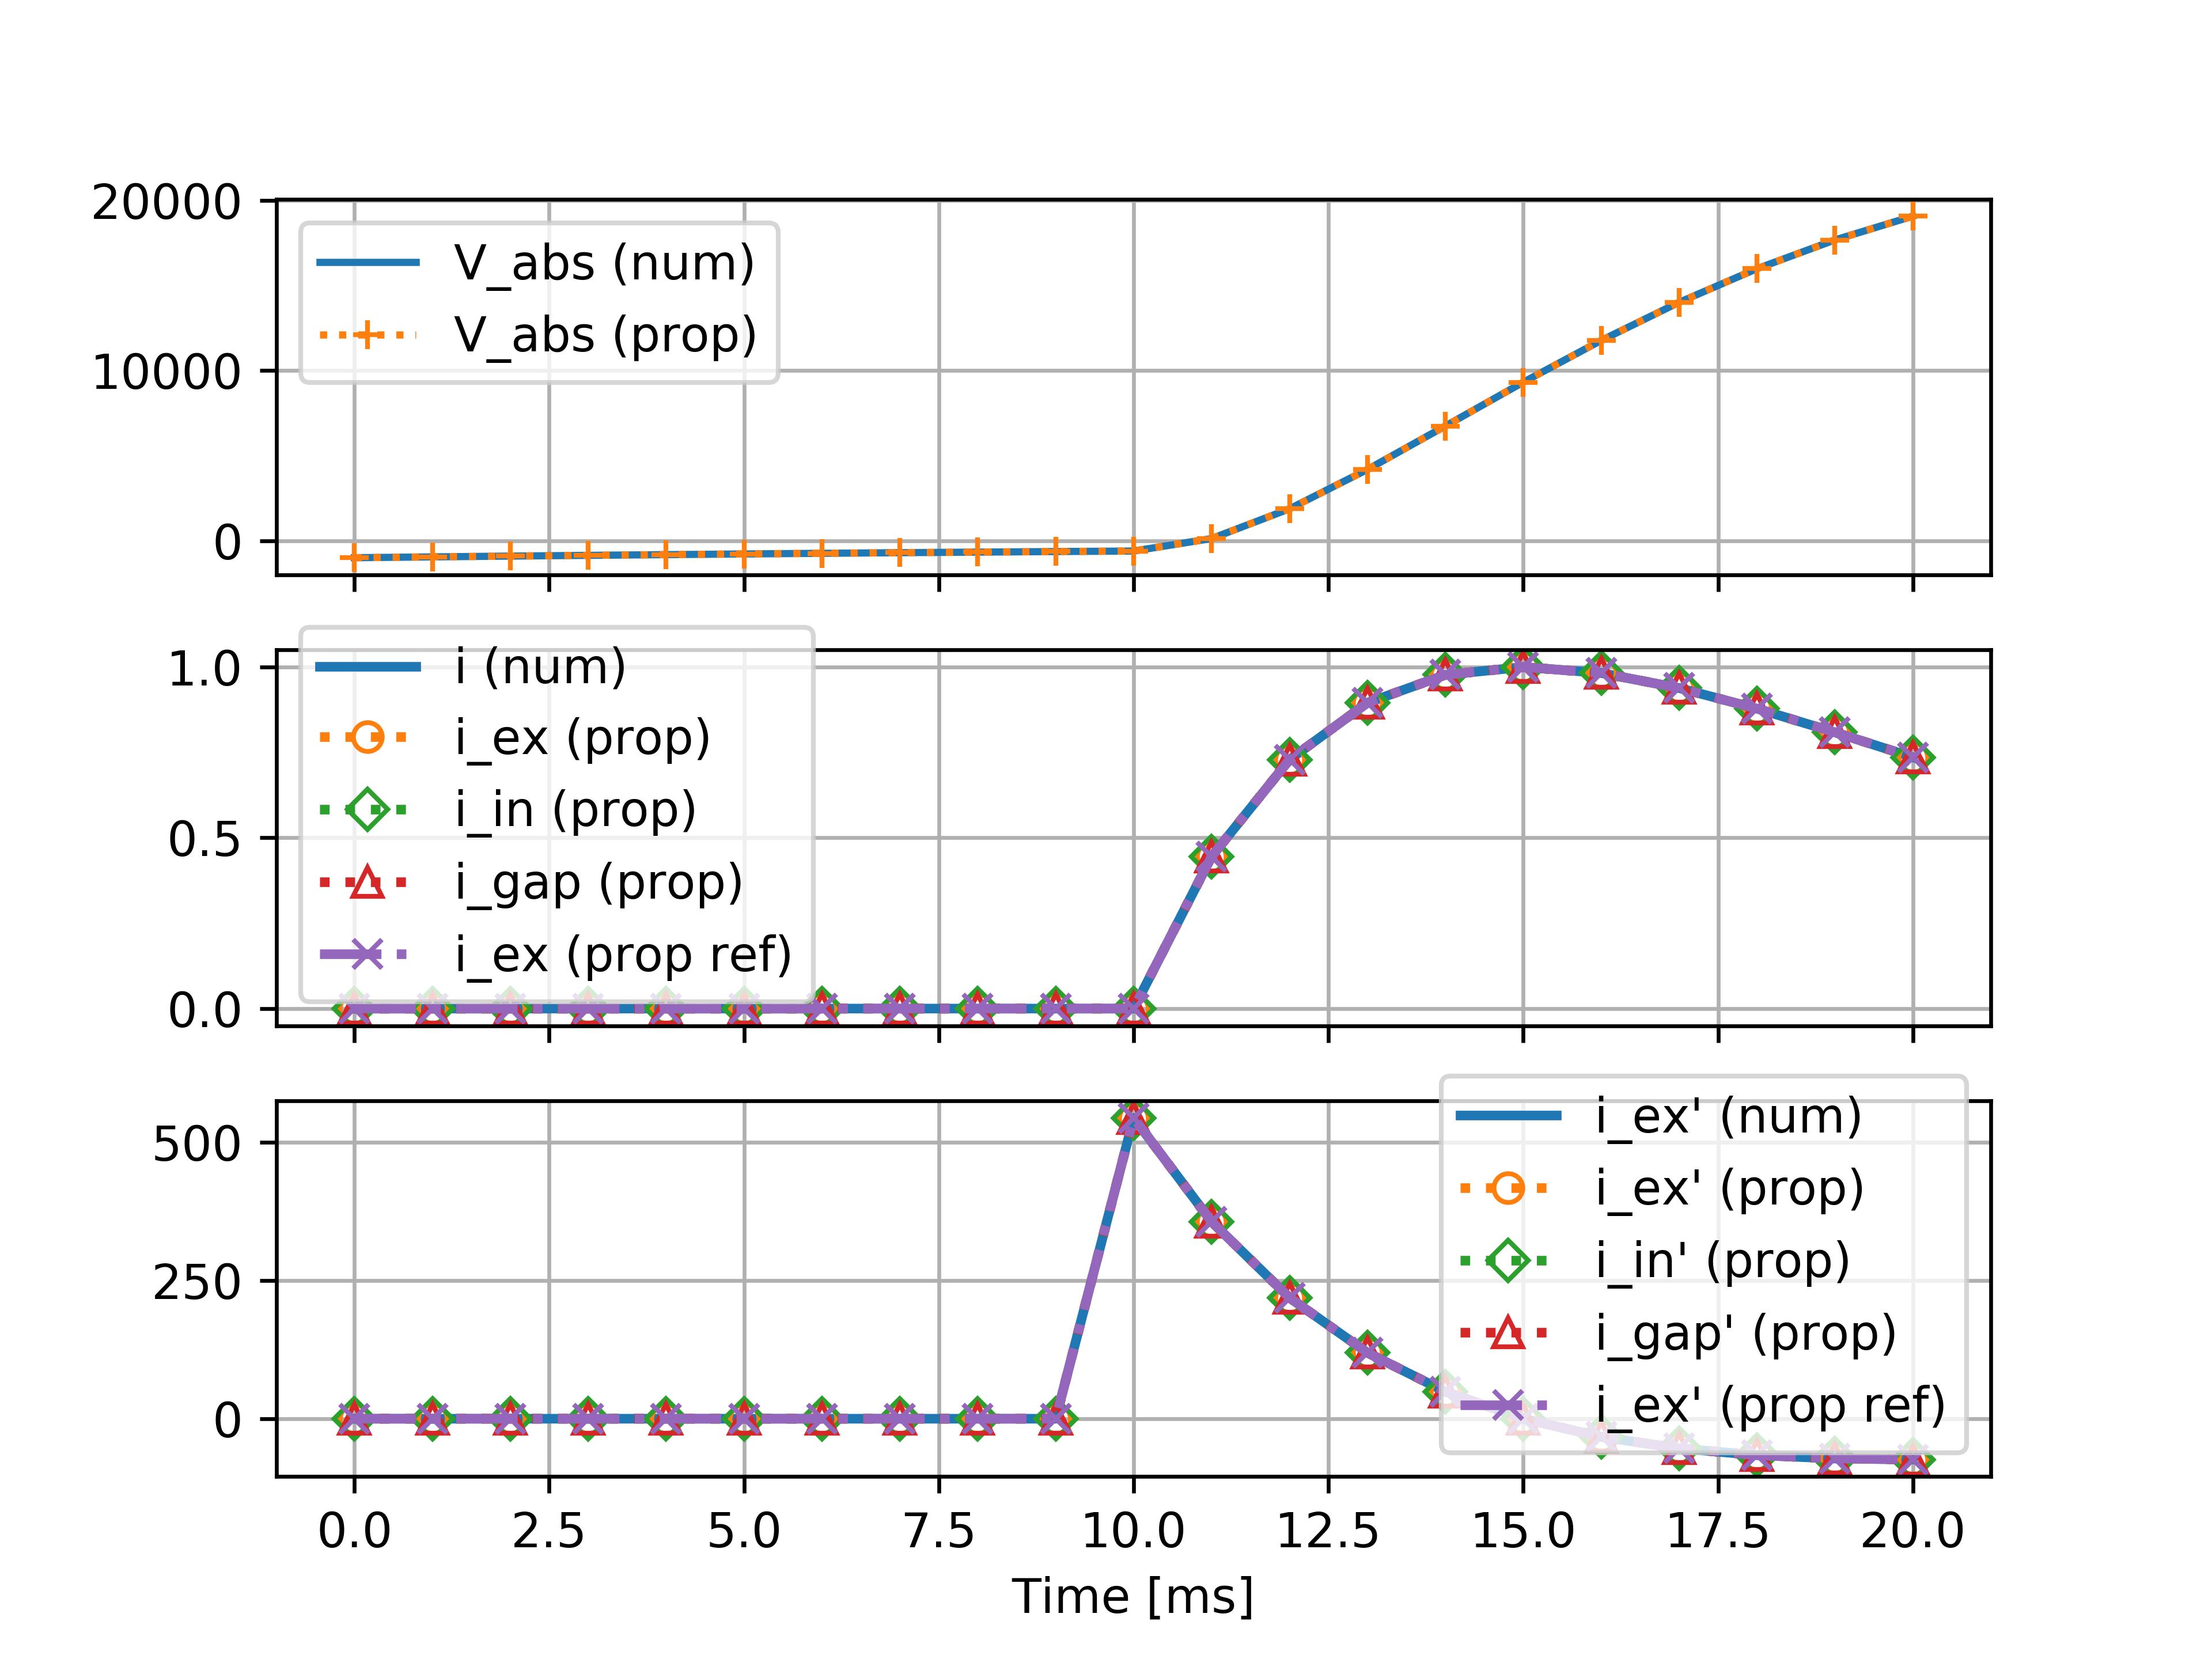 V_abs, i_ex and i_ex' timeseries plots